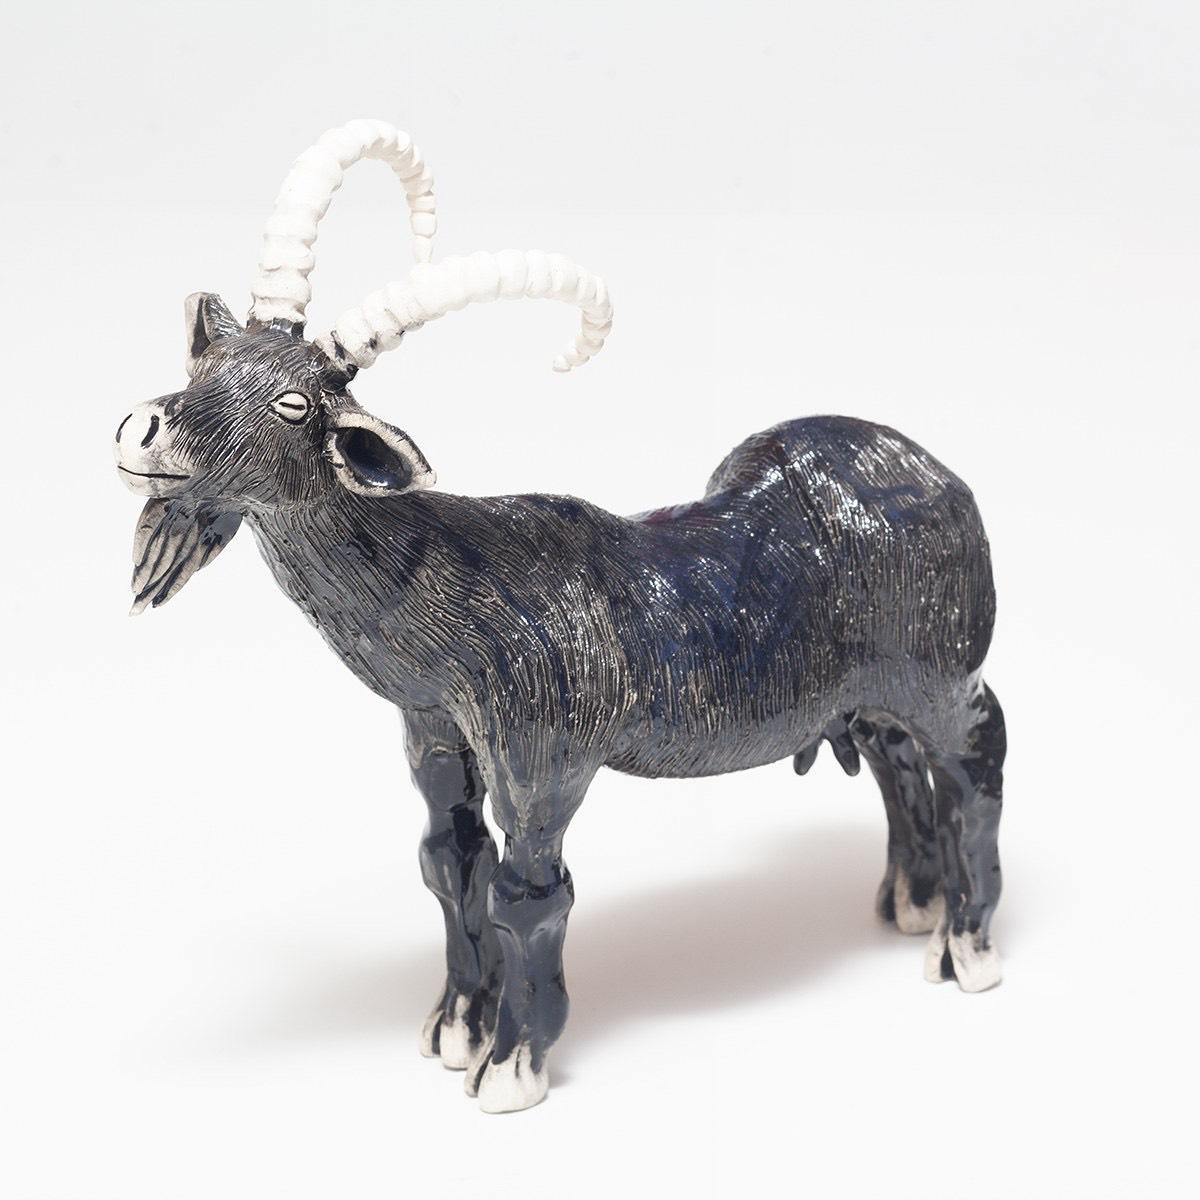 Koza czarna, 2018